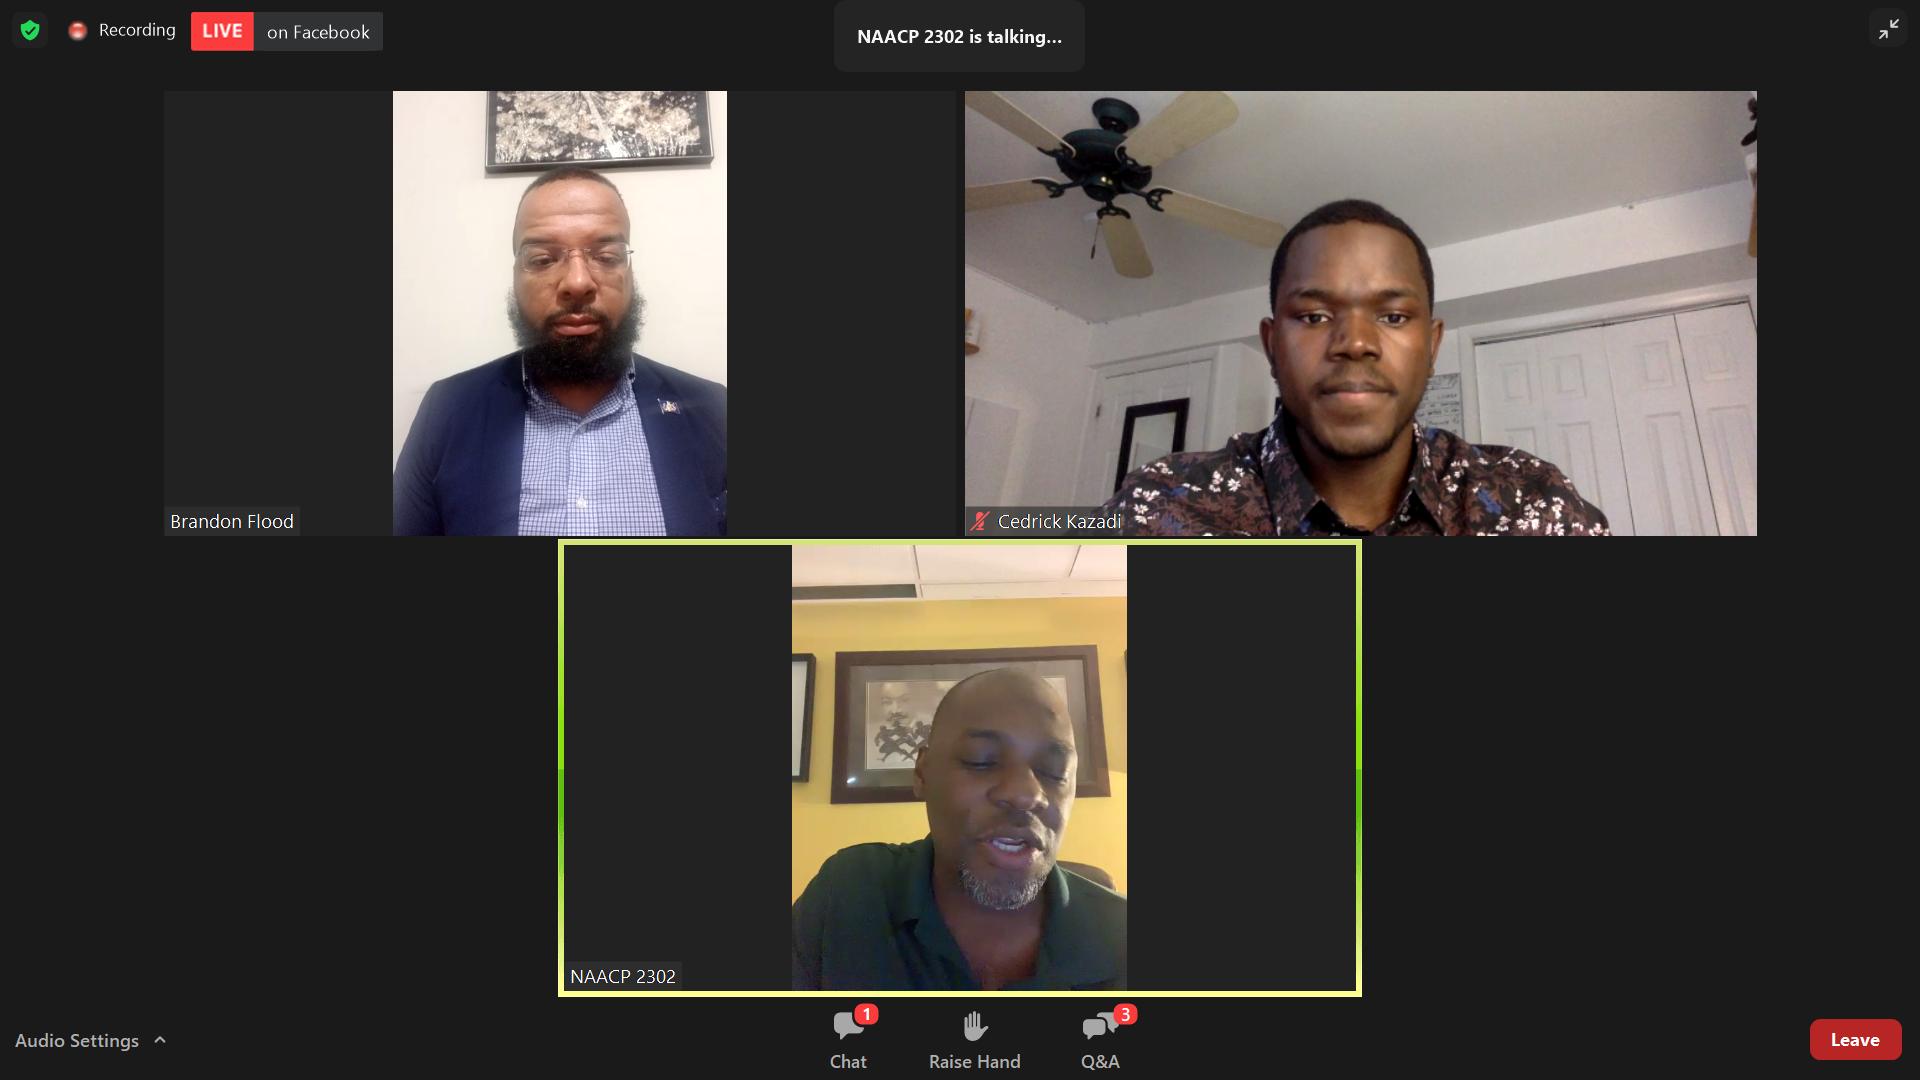 From top left, clockwise: Pa. Bureau of Pardons Secretary Brandon Flood; Cedrick Kazadi, Millersville University chapter of the NAACP; and Blanding Watson, NAACP Lancaster, are seen in a screenshot from the NAACP Lancaster's webinar on the pardon system on Wednesday, April 7, 2021.